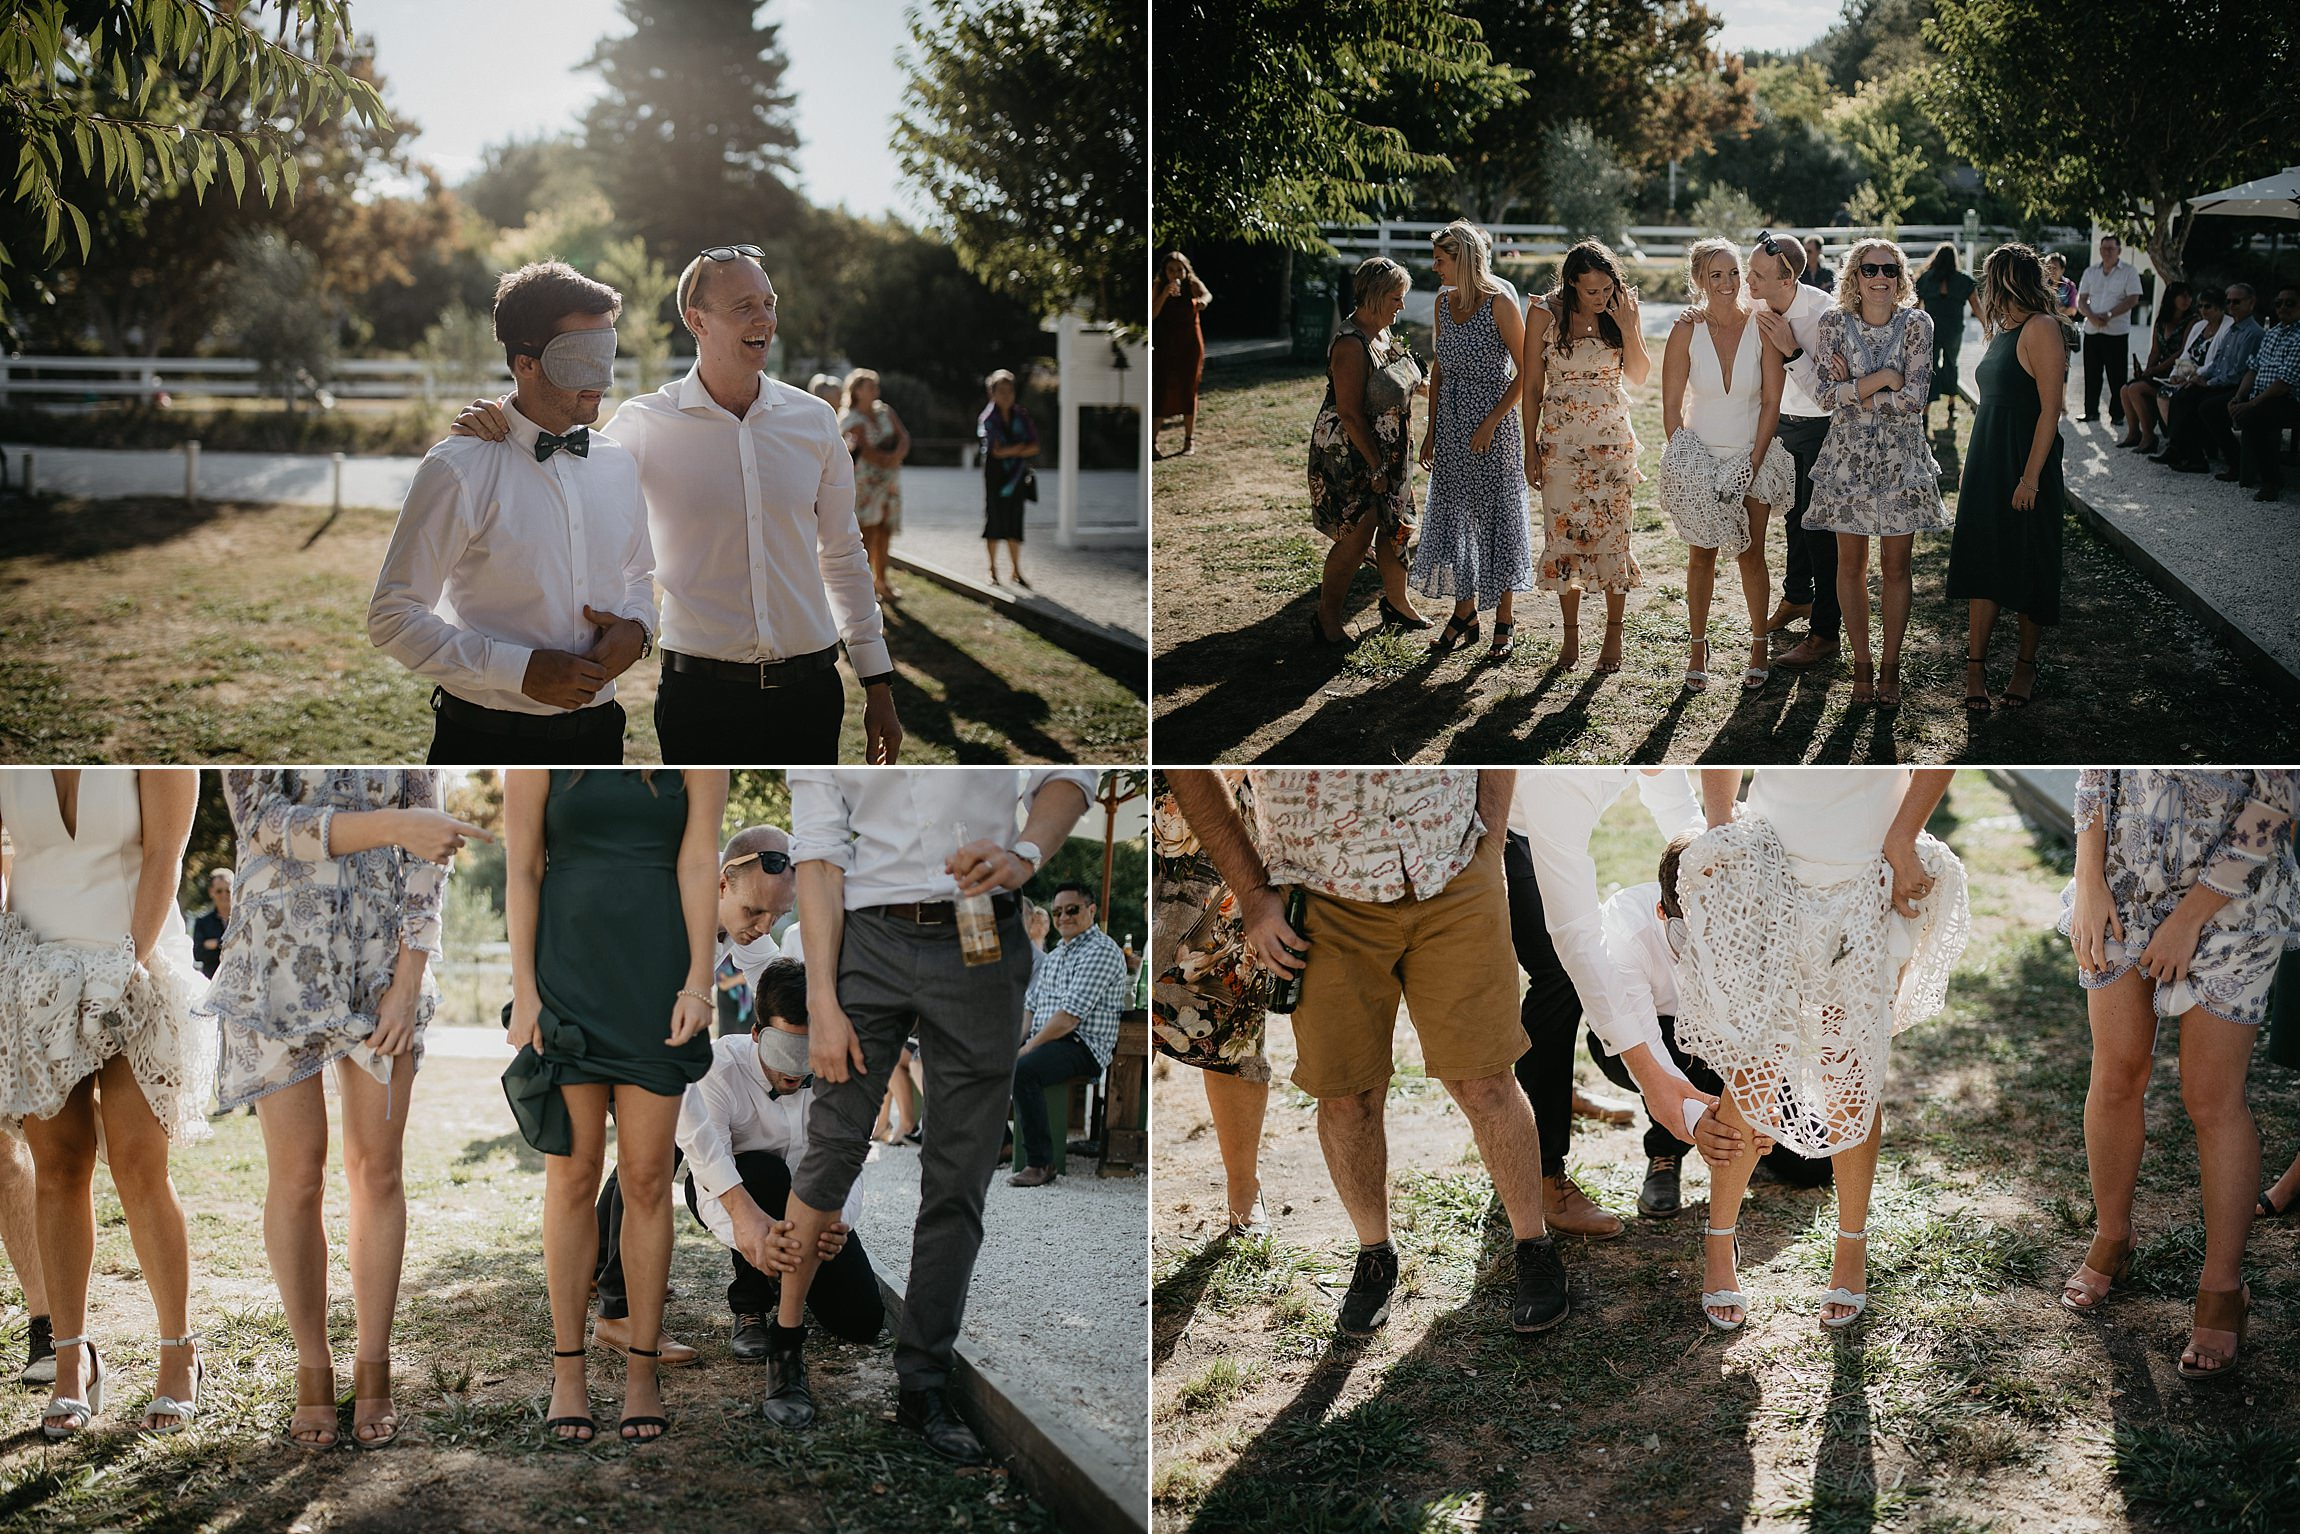 oldforestschool-wedding-blog-144.jpg